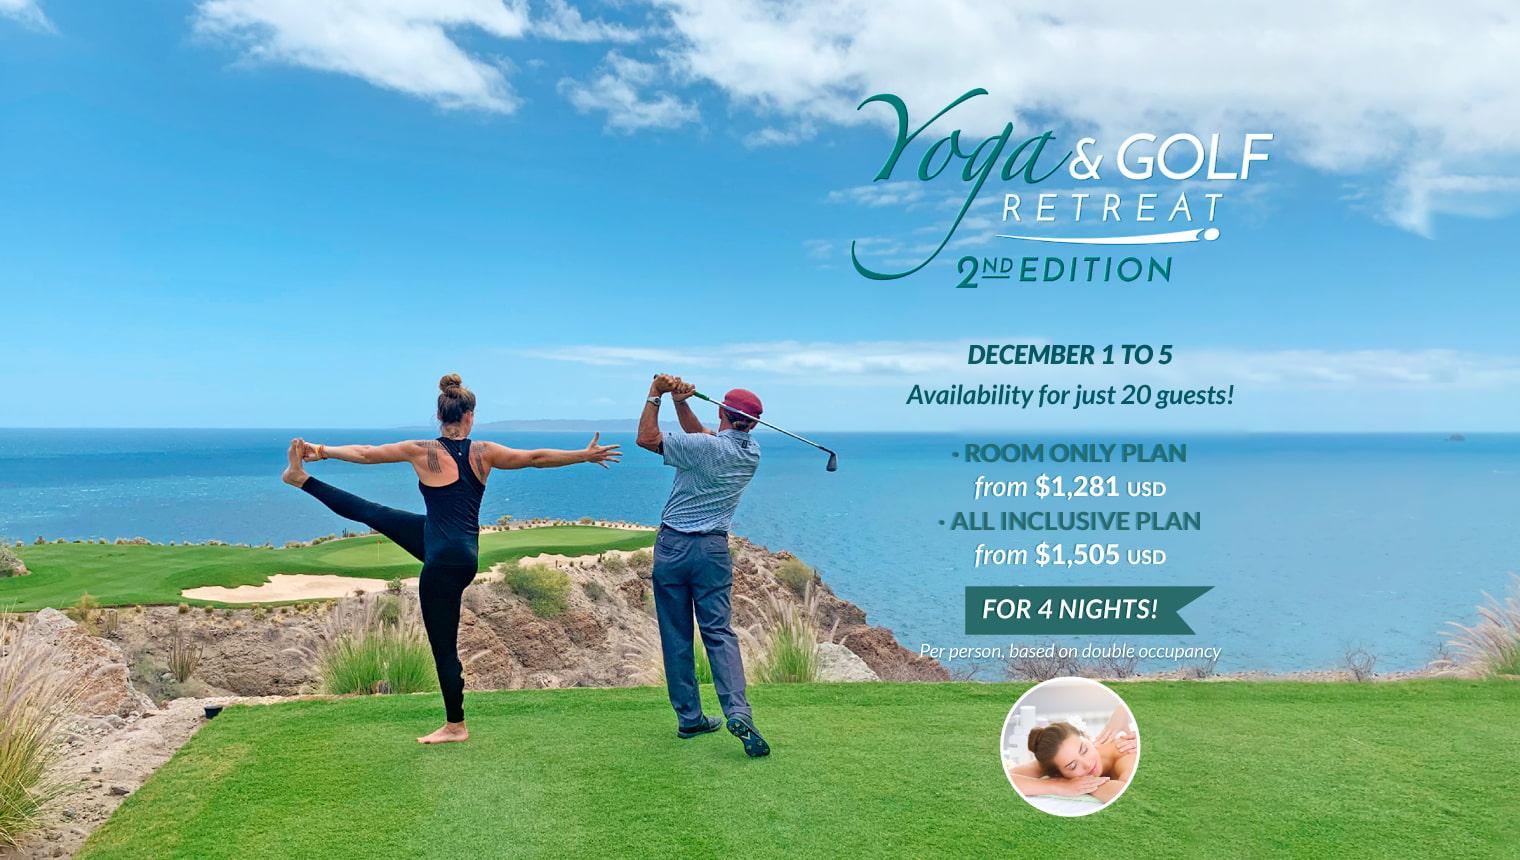 Yoga & Golf Retreat - Second Edition